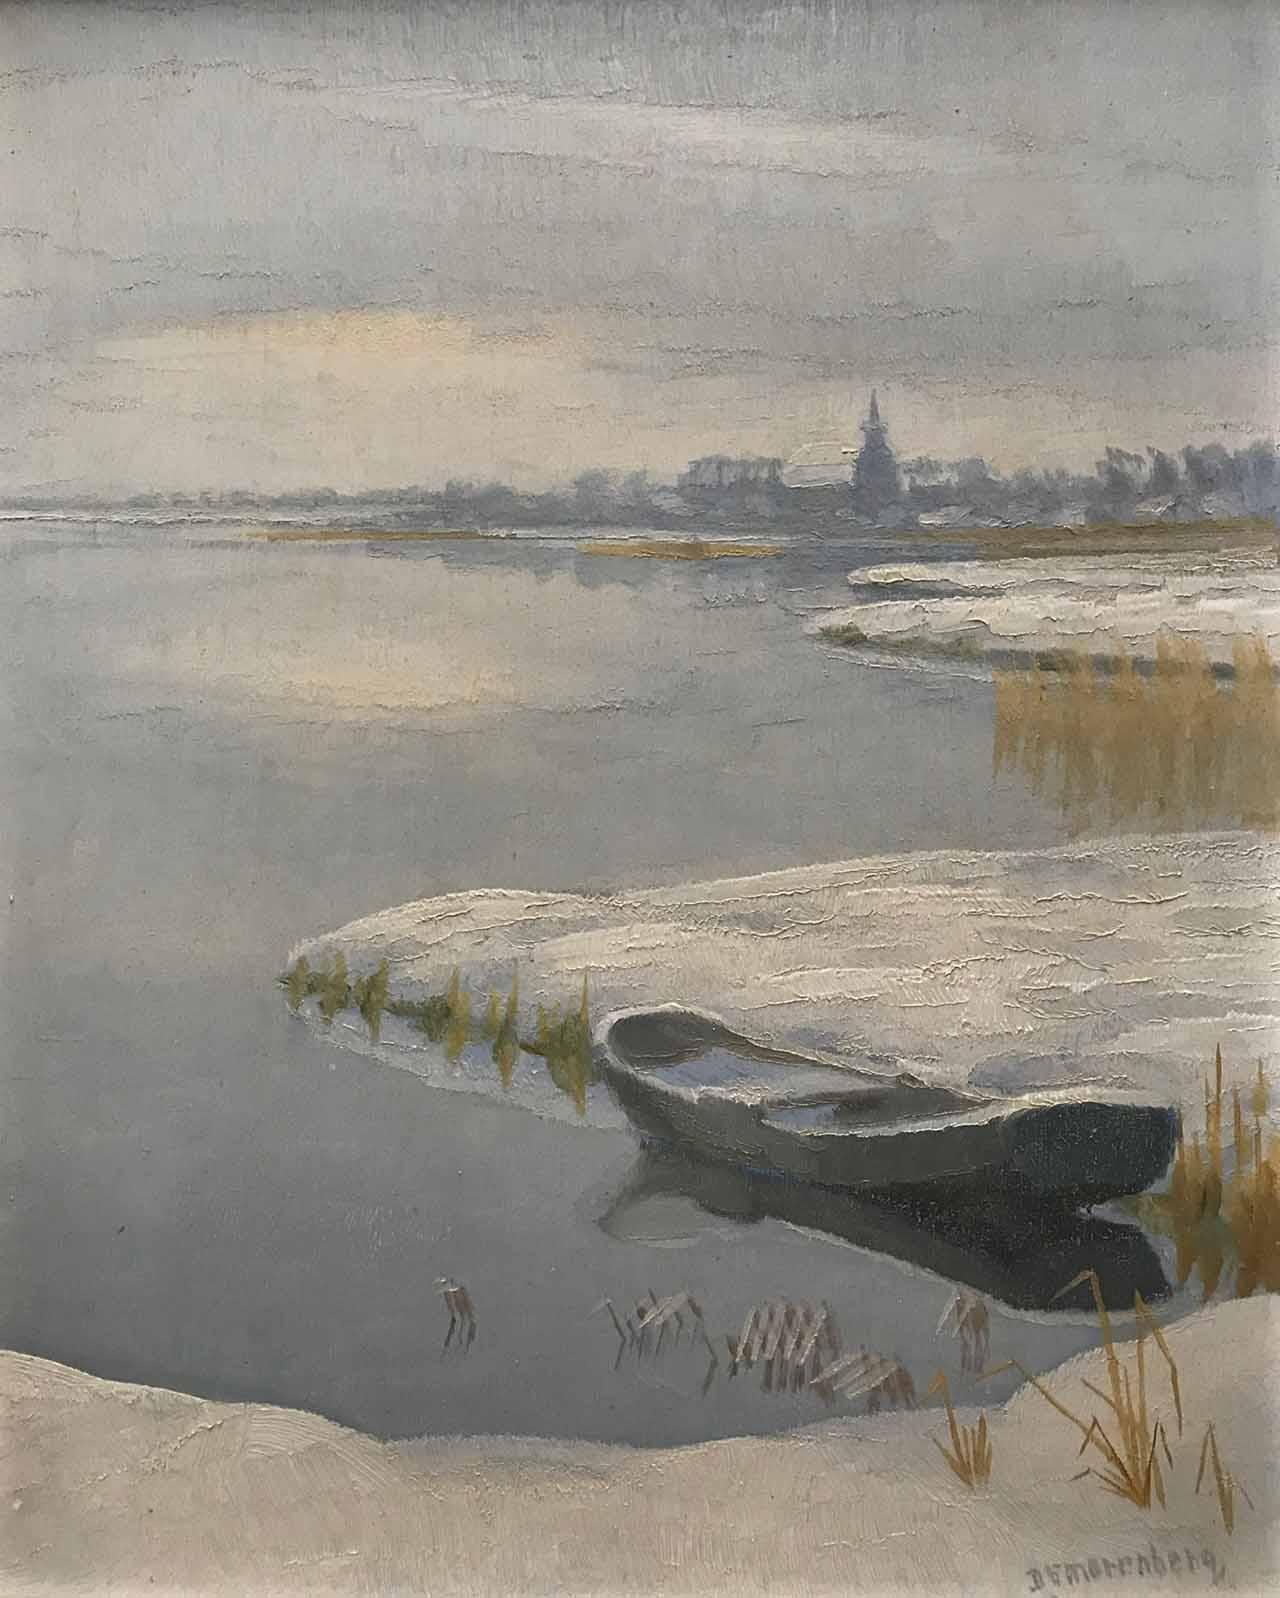 Dirk Smorenberg - Winters plassengezicht